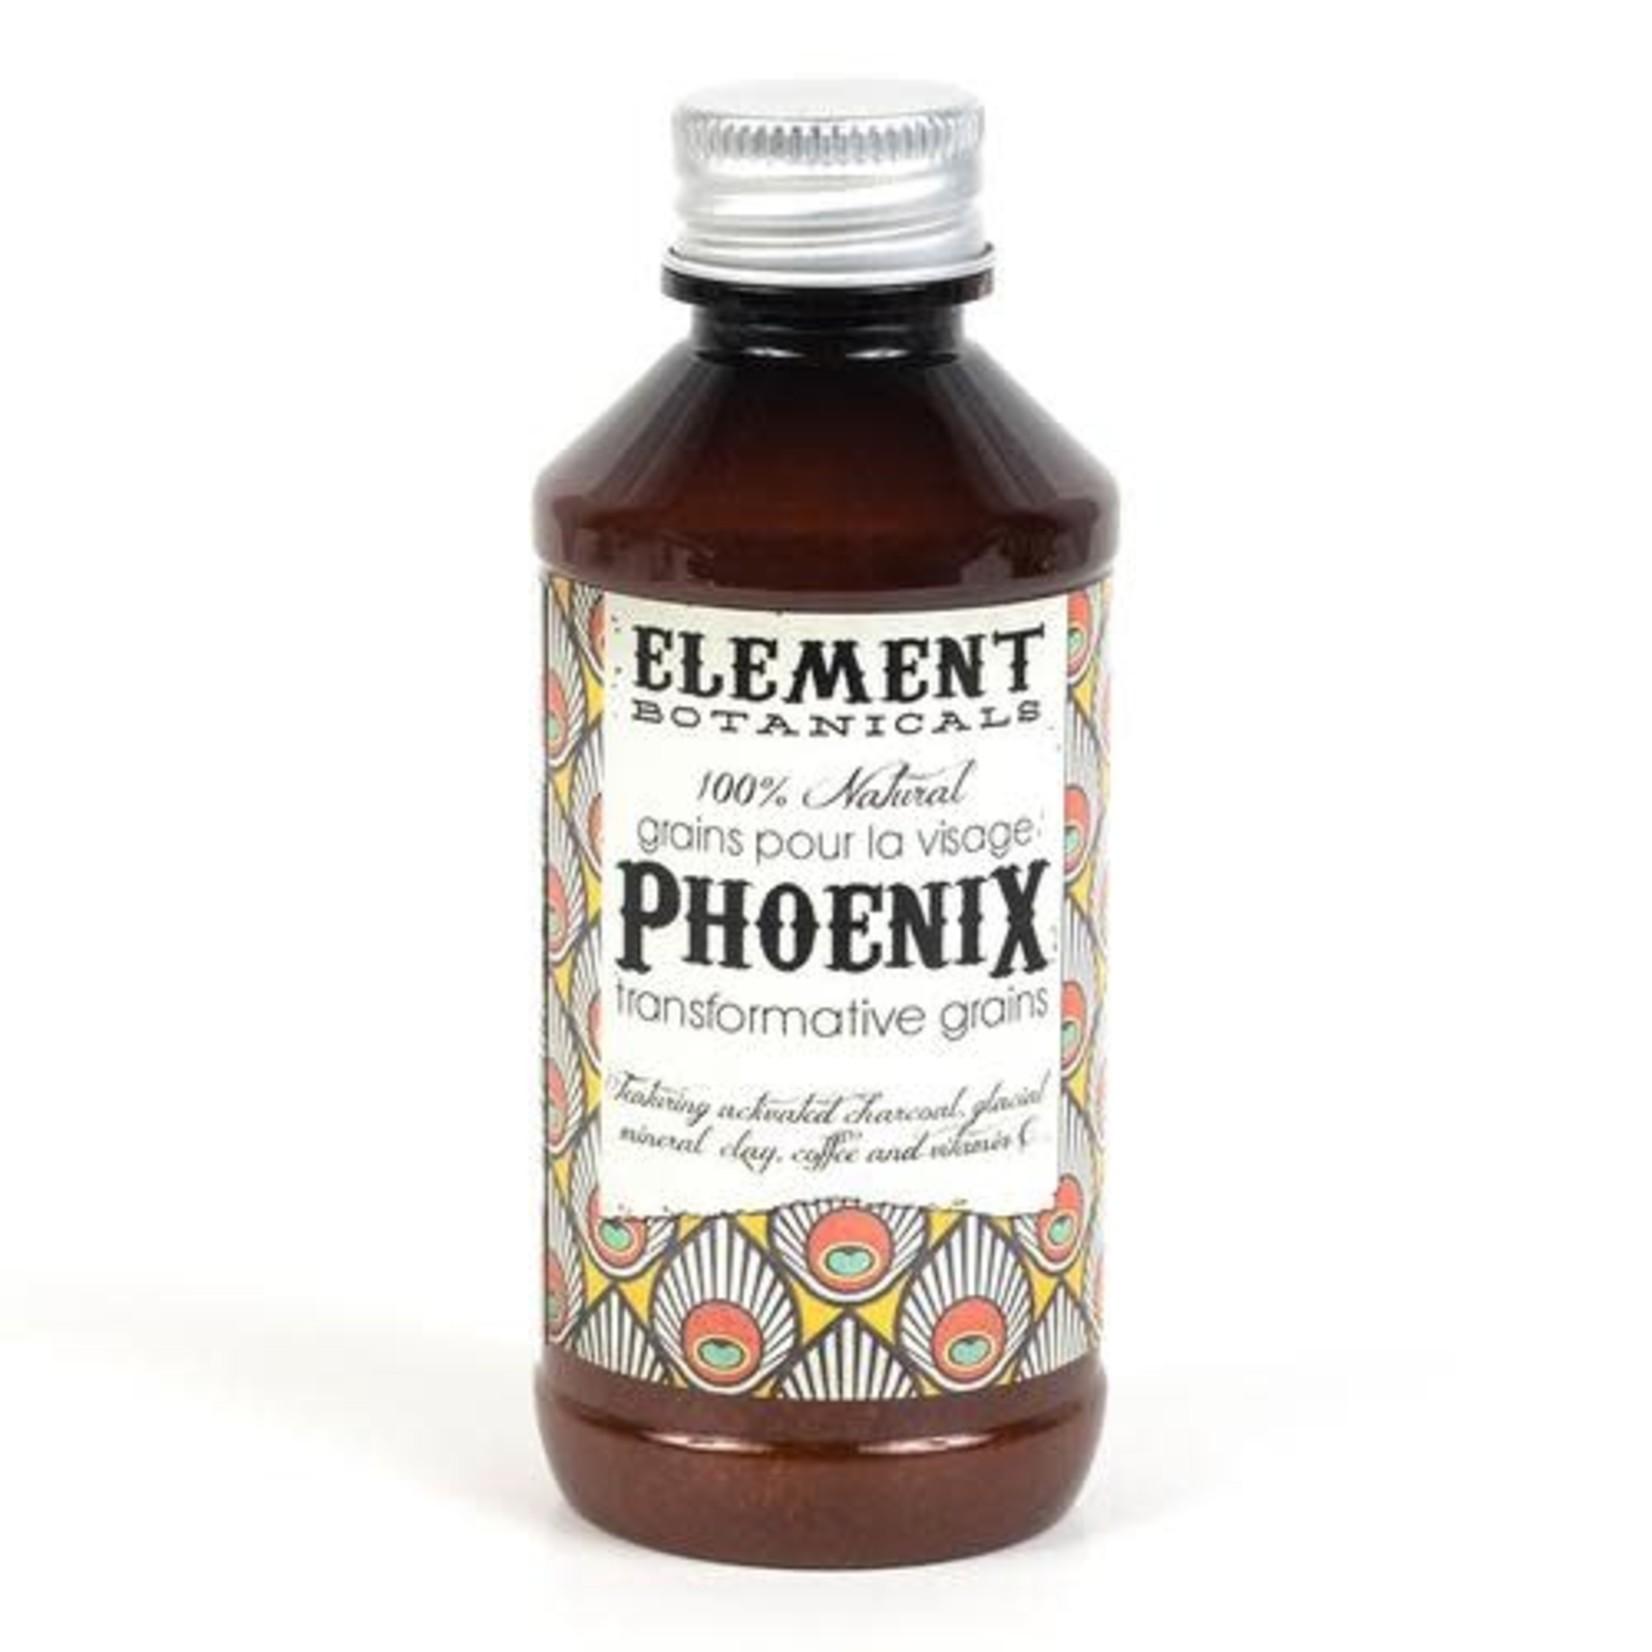 ELEMENT BOTANICALS PHEONIX TRANSFORMATIVE GRAINS